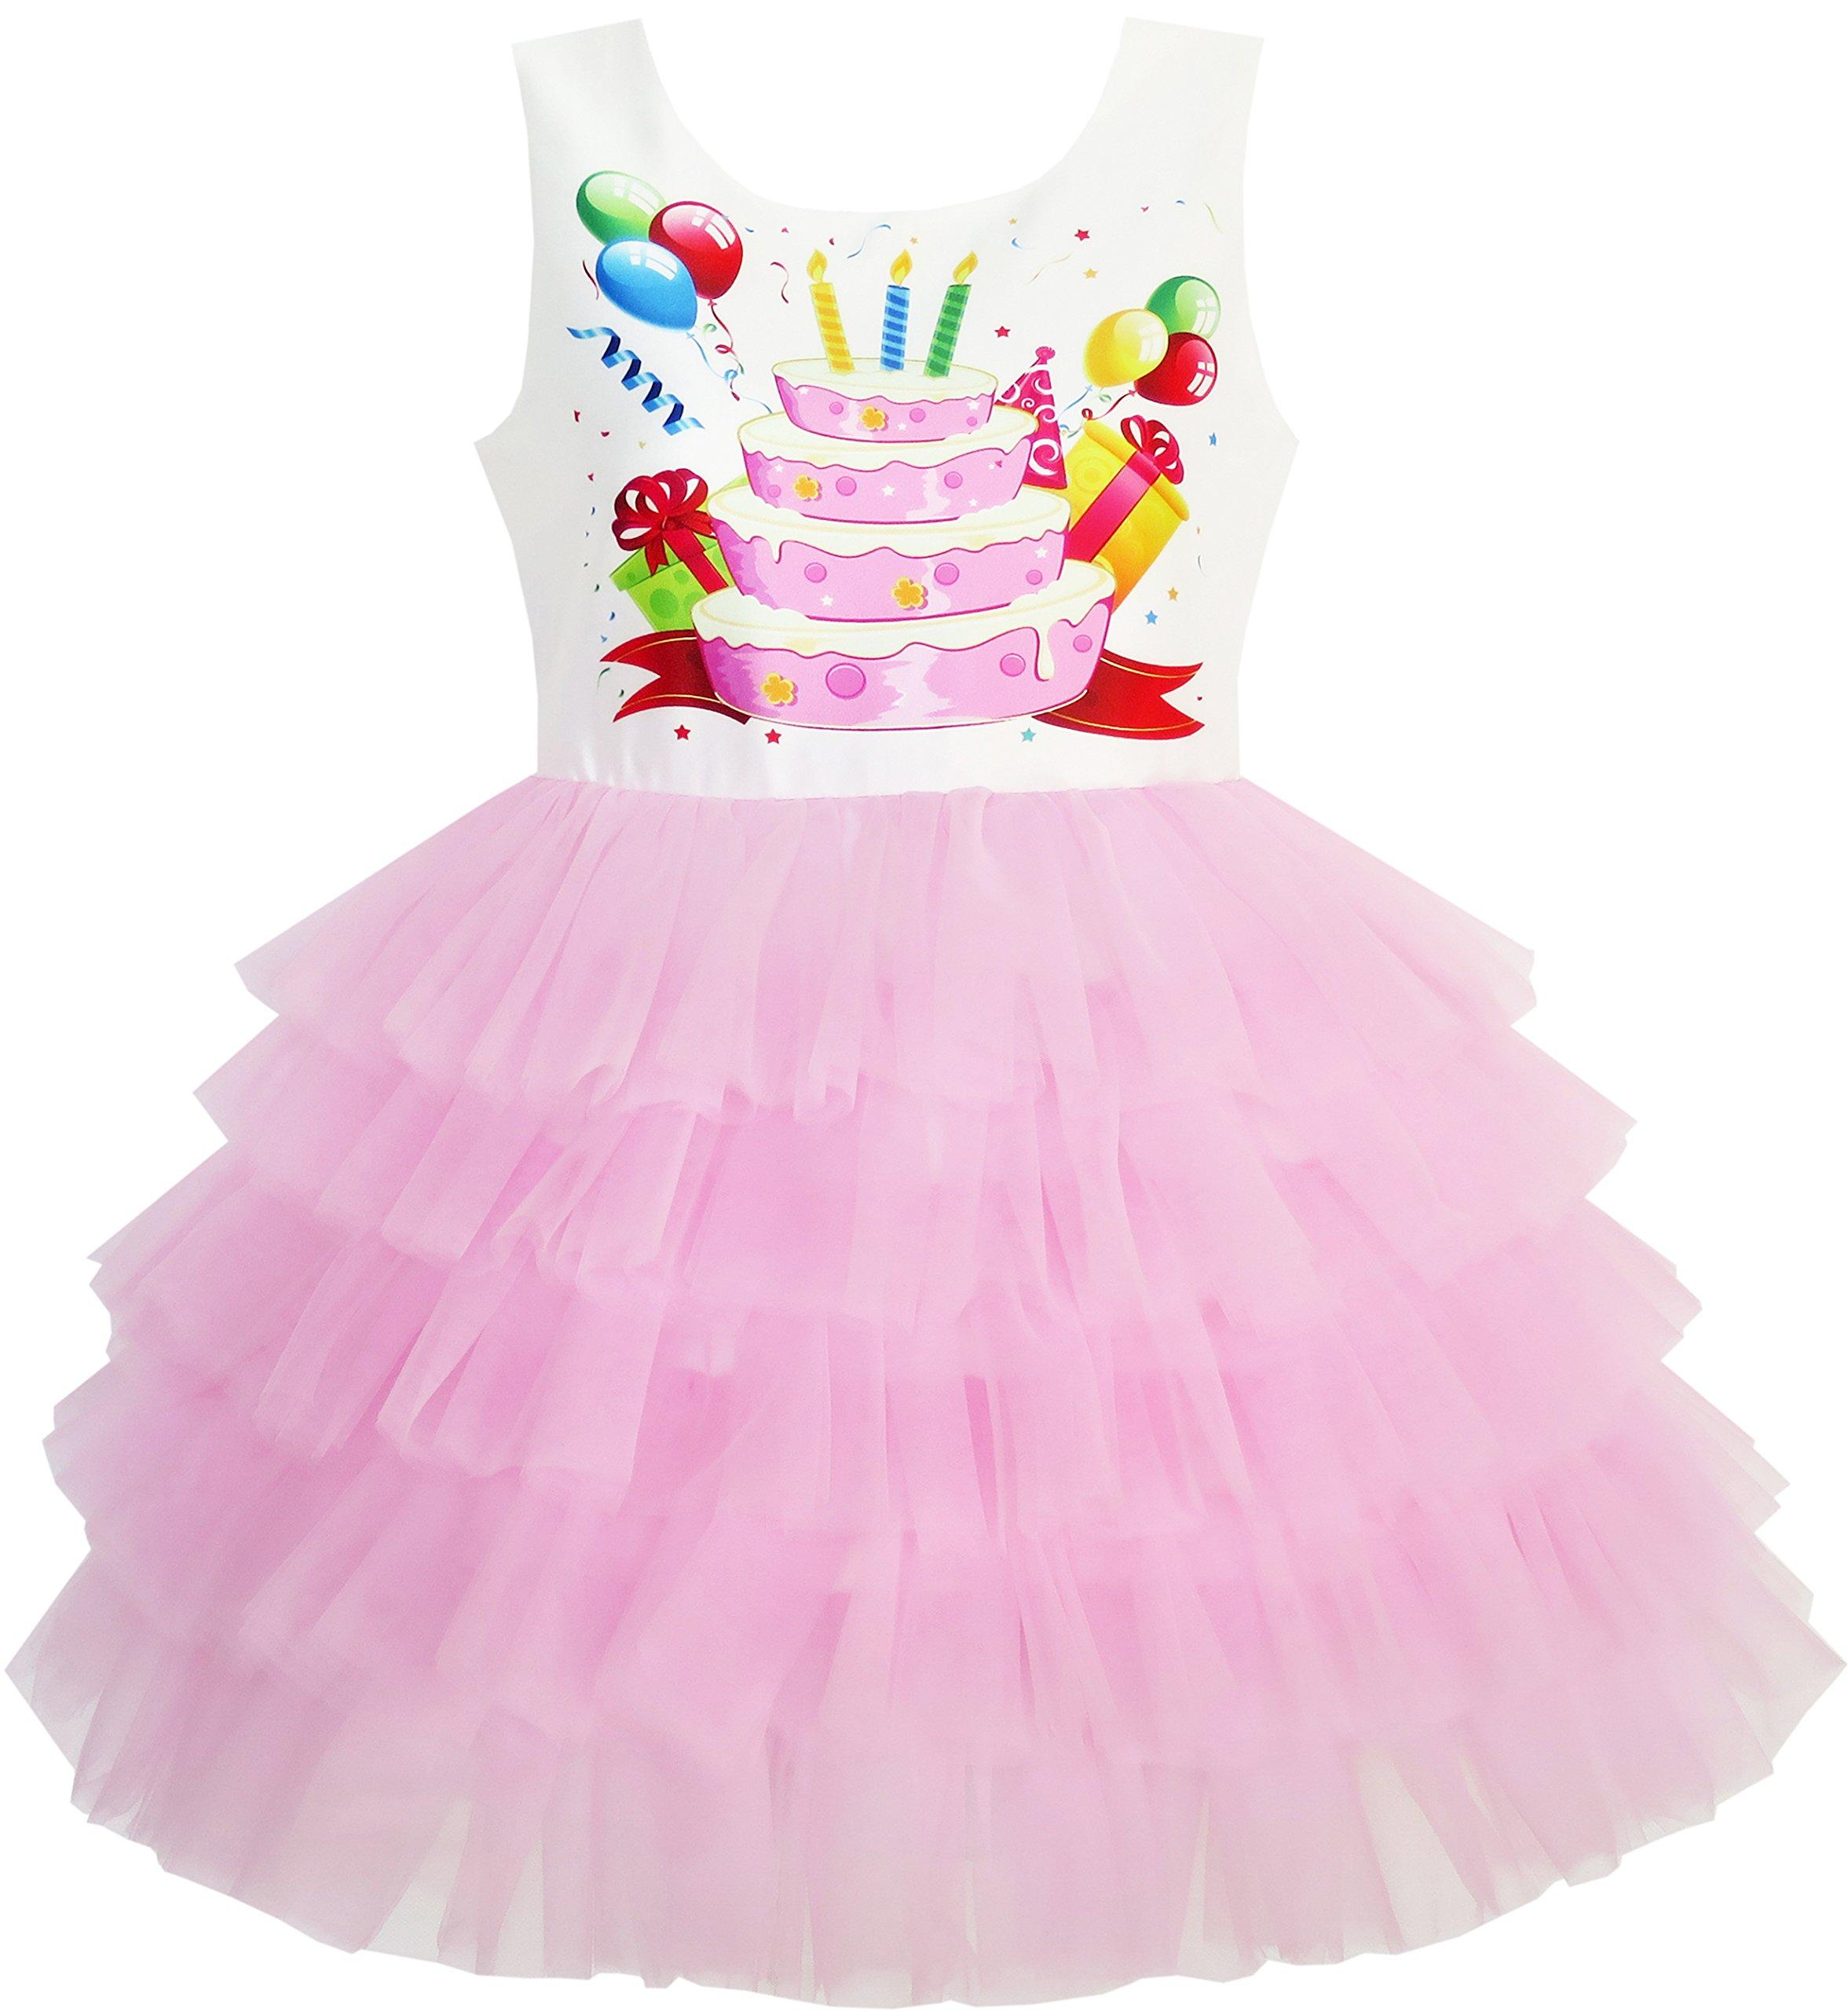 b2dae239e27 Sunny Fashion Girls Dress Birthday Princess Ruffle Dress Cake Balloon Print